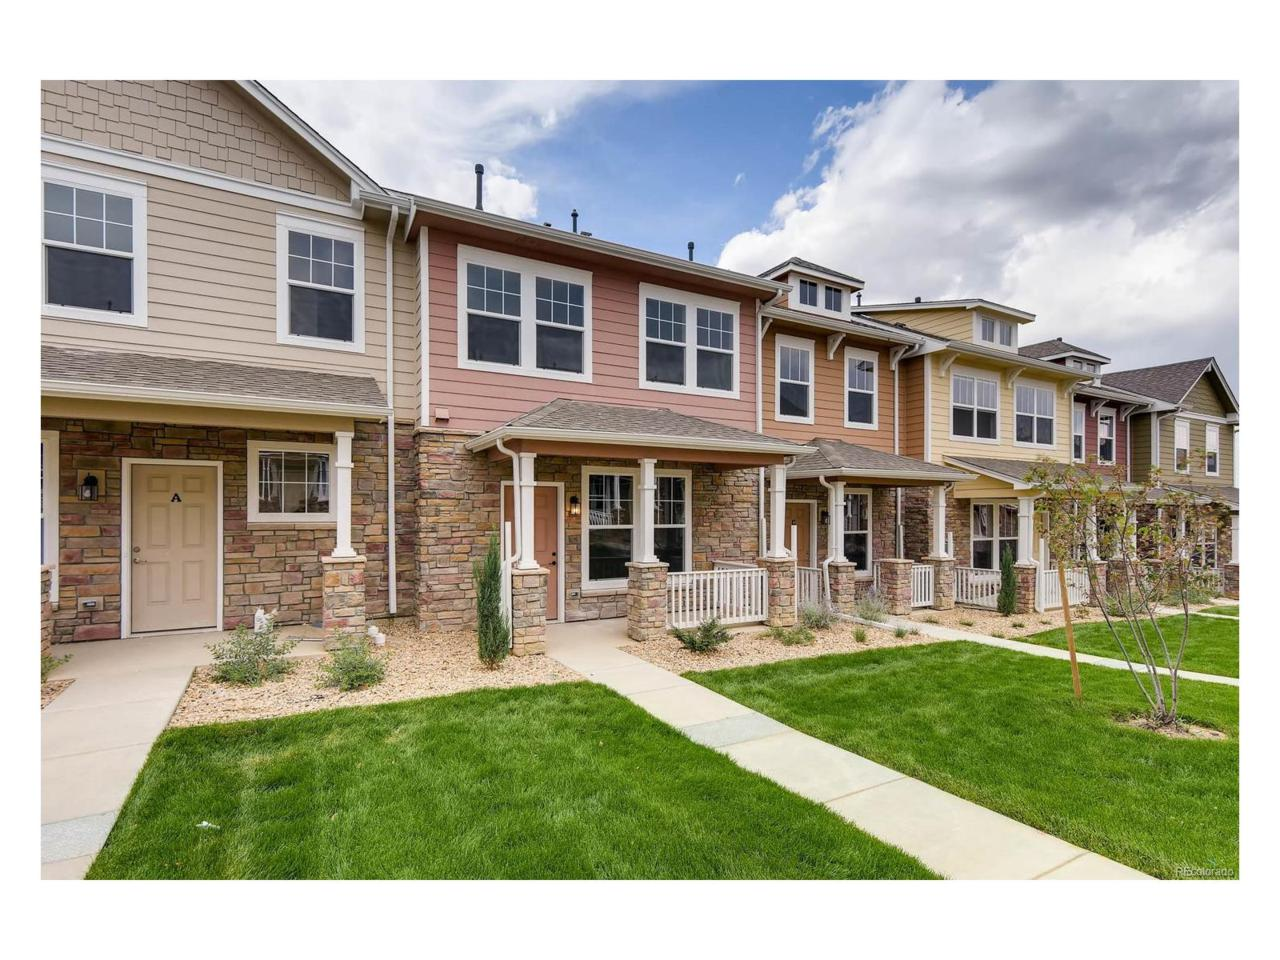 13752 Garfield Street B, Thornton, CO 80602 (MLS #7431407) :: 8z Real Estate